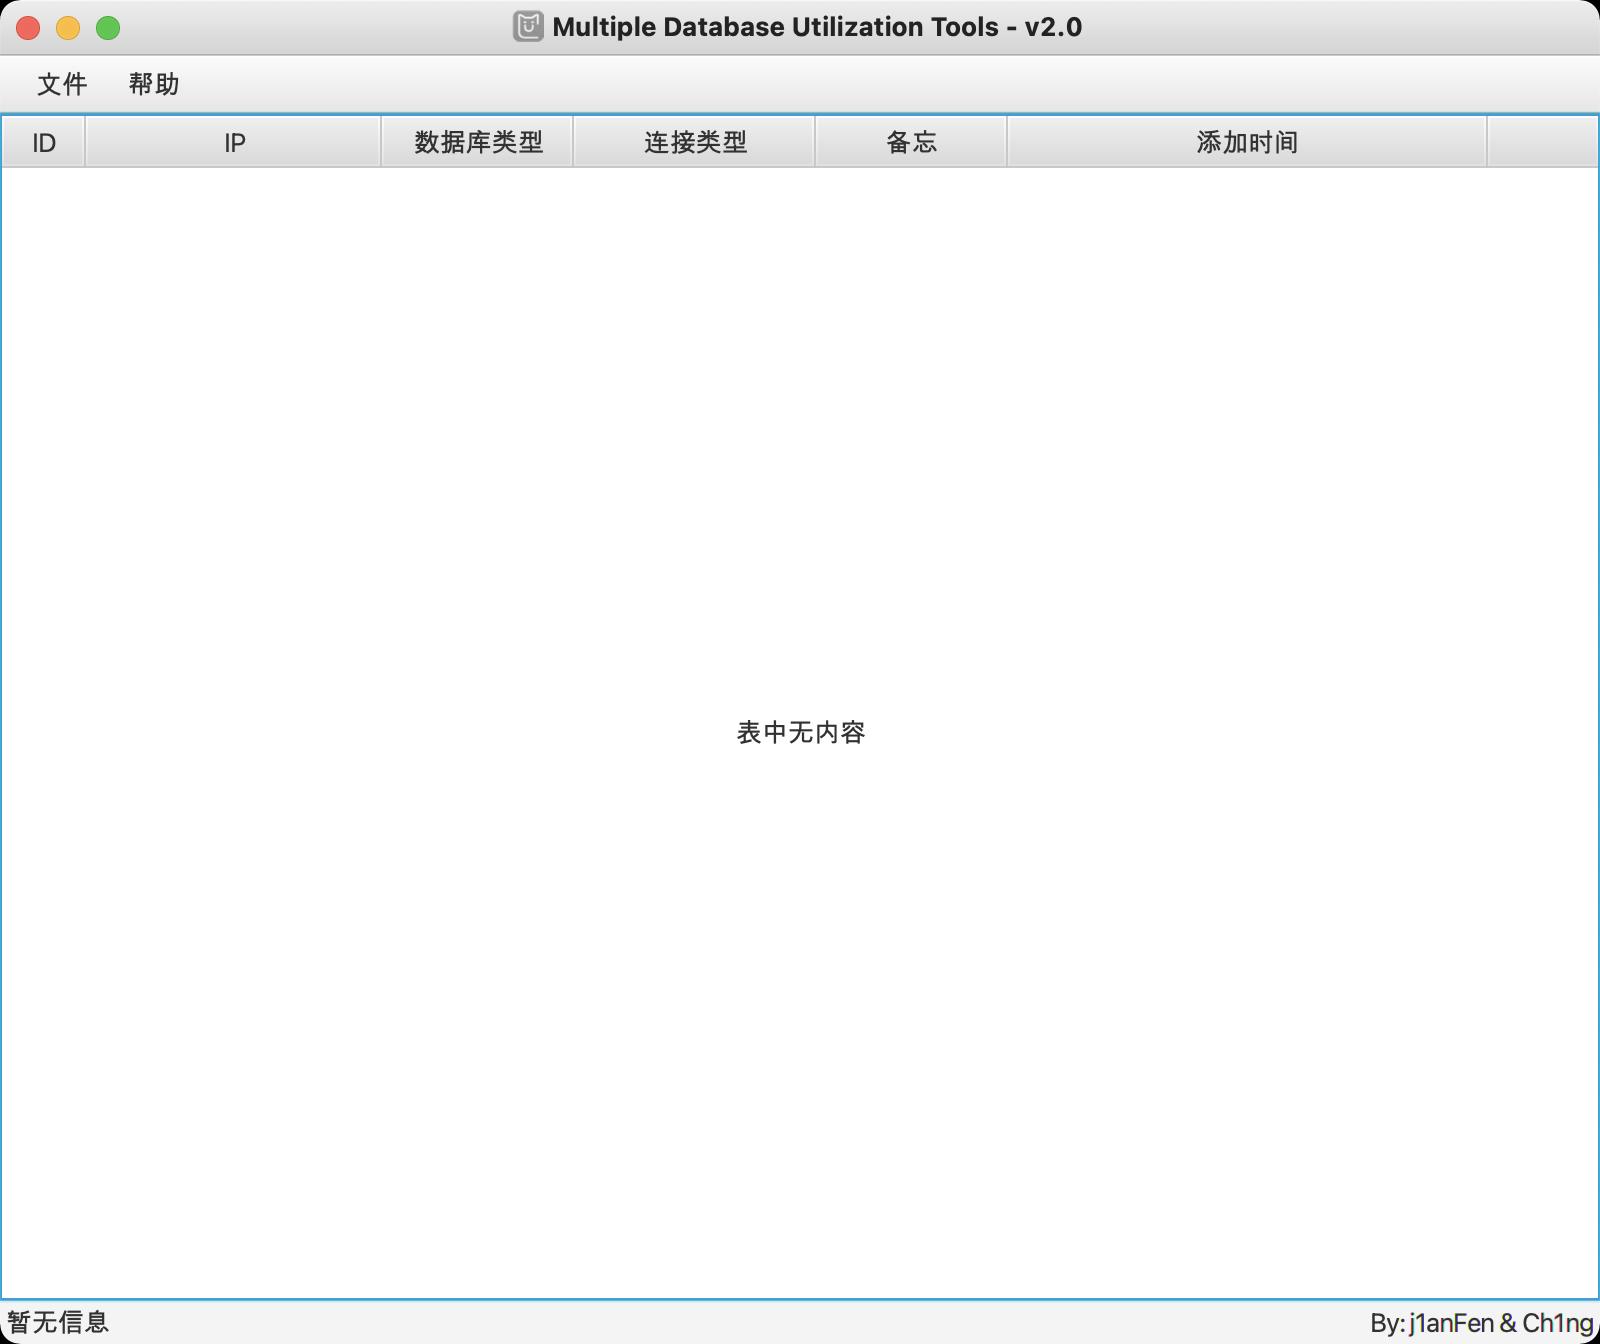 MDUT 中文的数据库跨平台利用工具